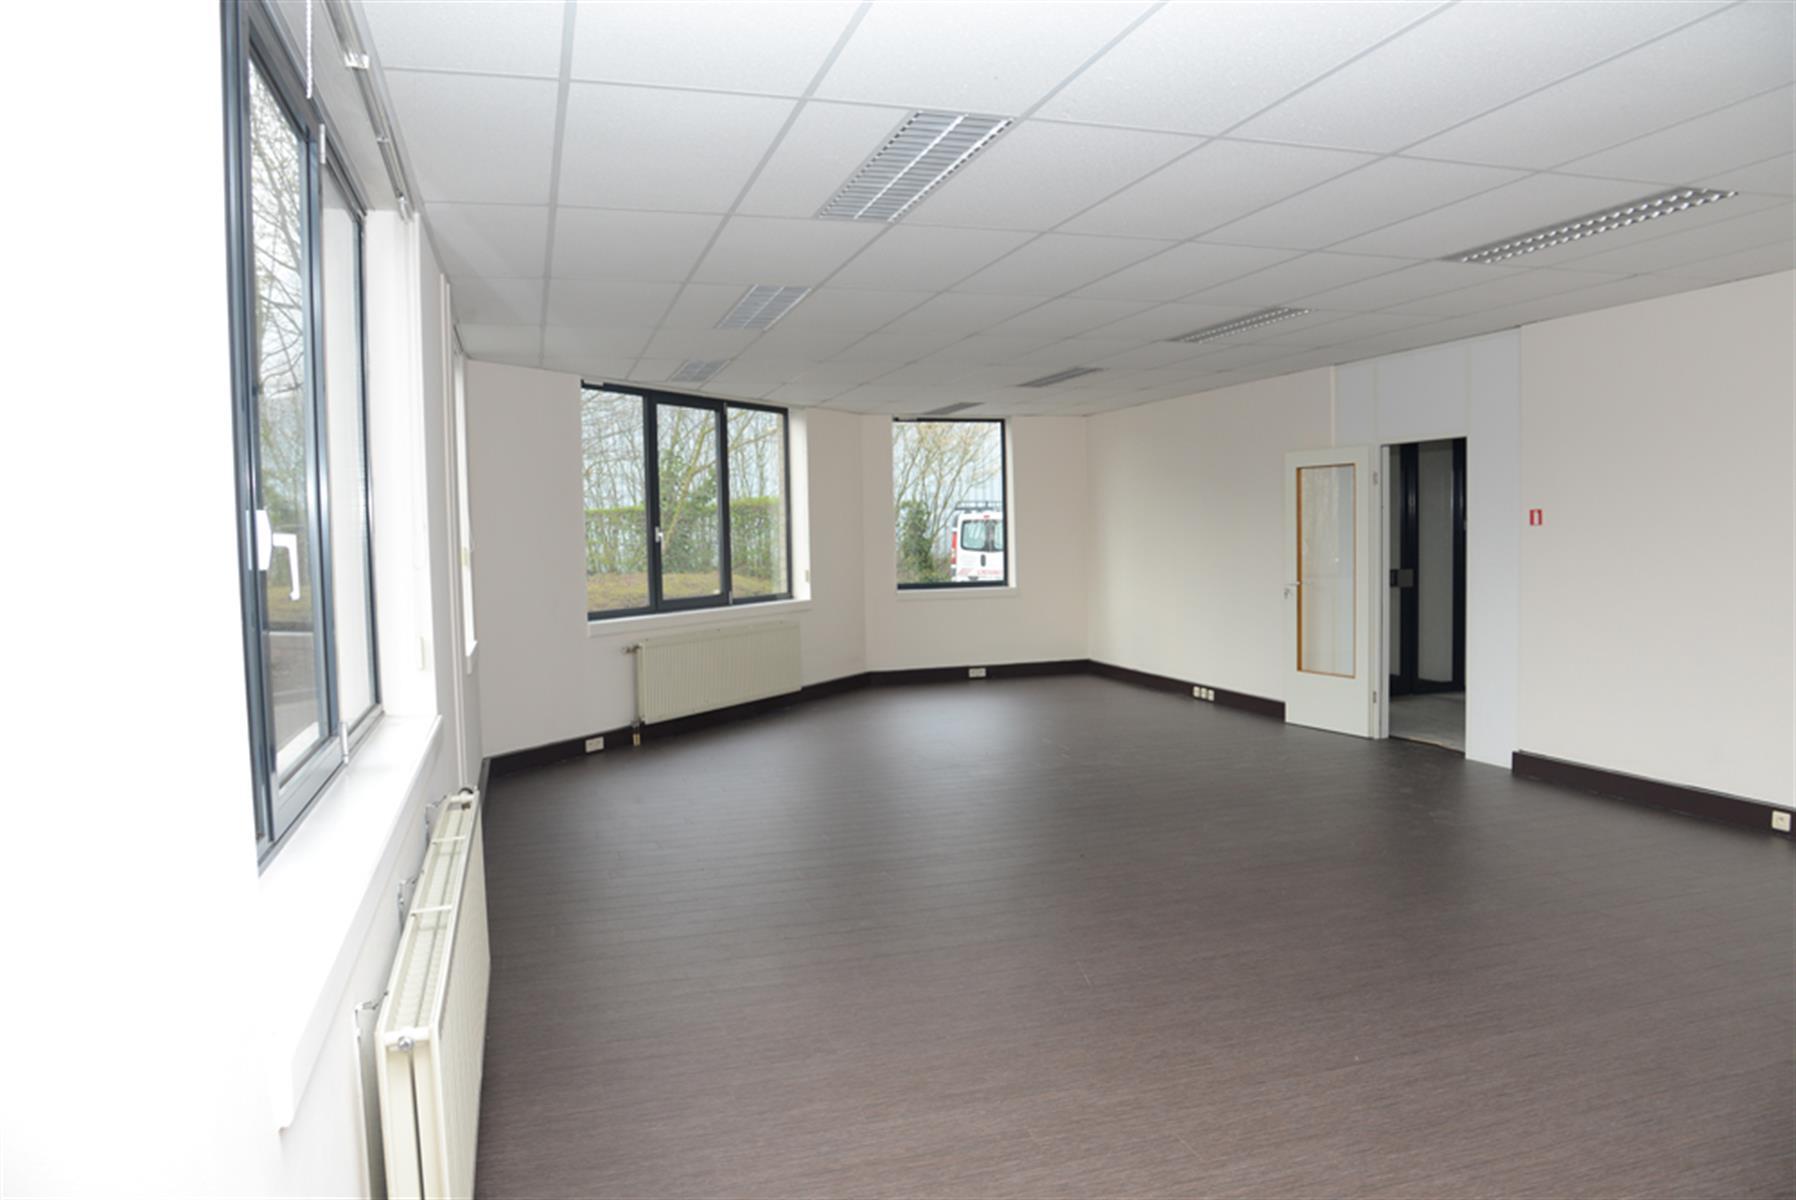 gebouw voor gemengd gebruik te huur UNIT H : MAGAZIJN 547m² MET KANTOOR 288m² - Ingberthoeveweg 3, 2630 Aartselaar, België 5